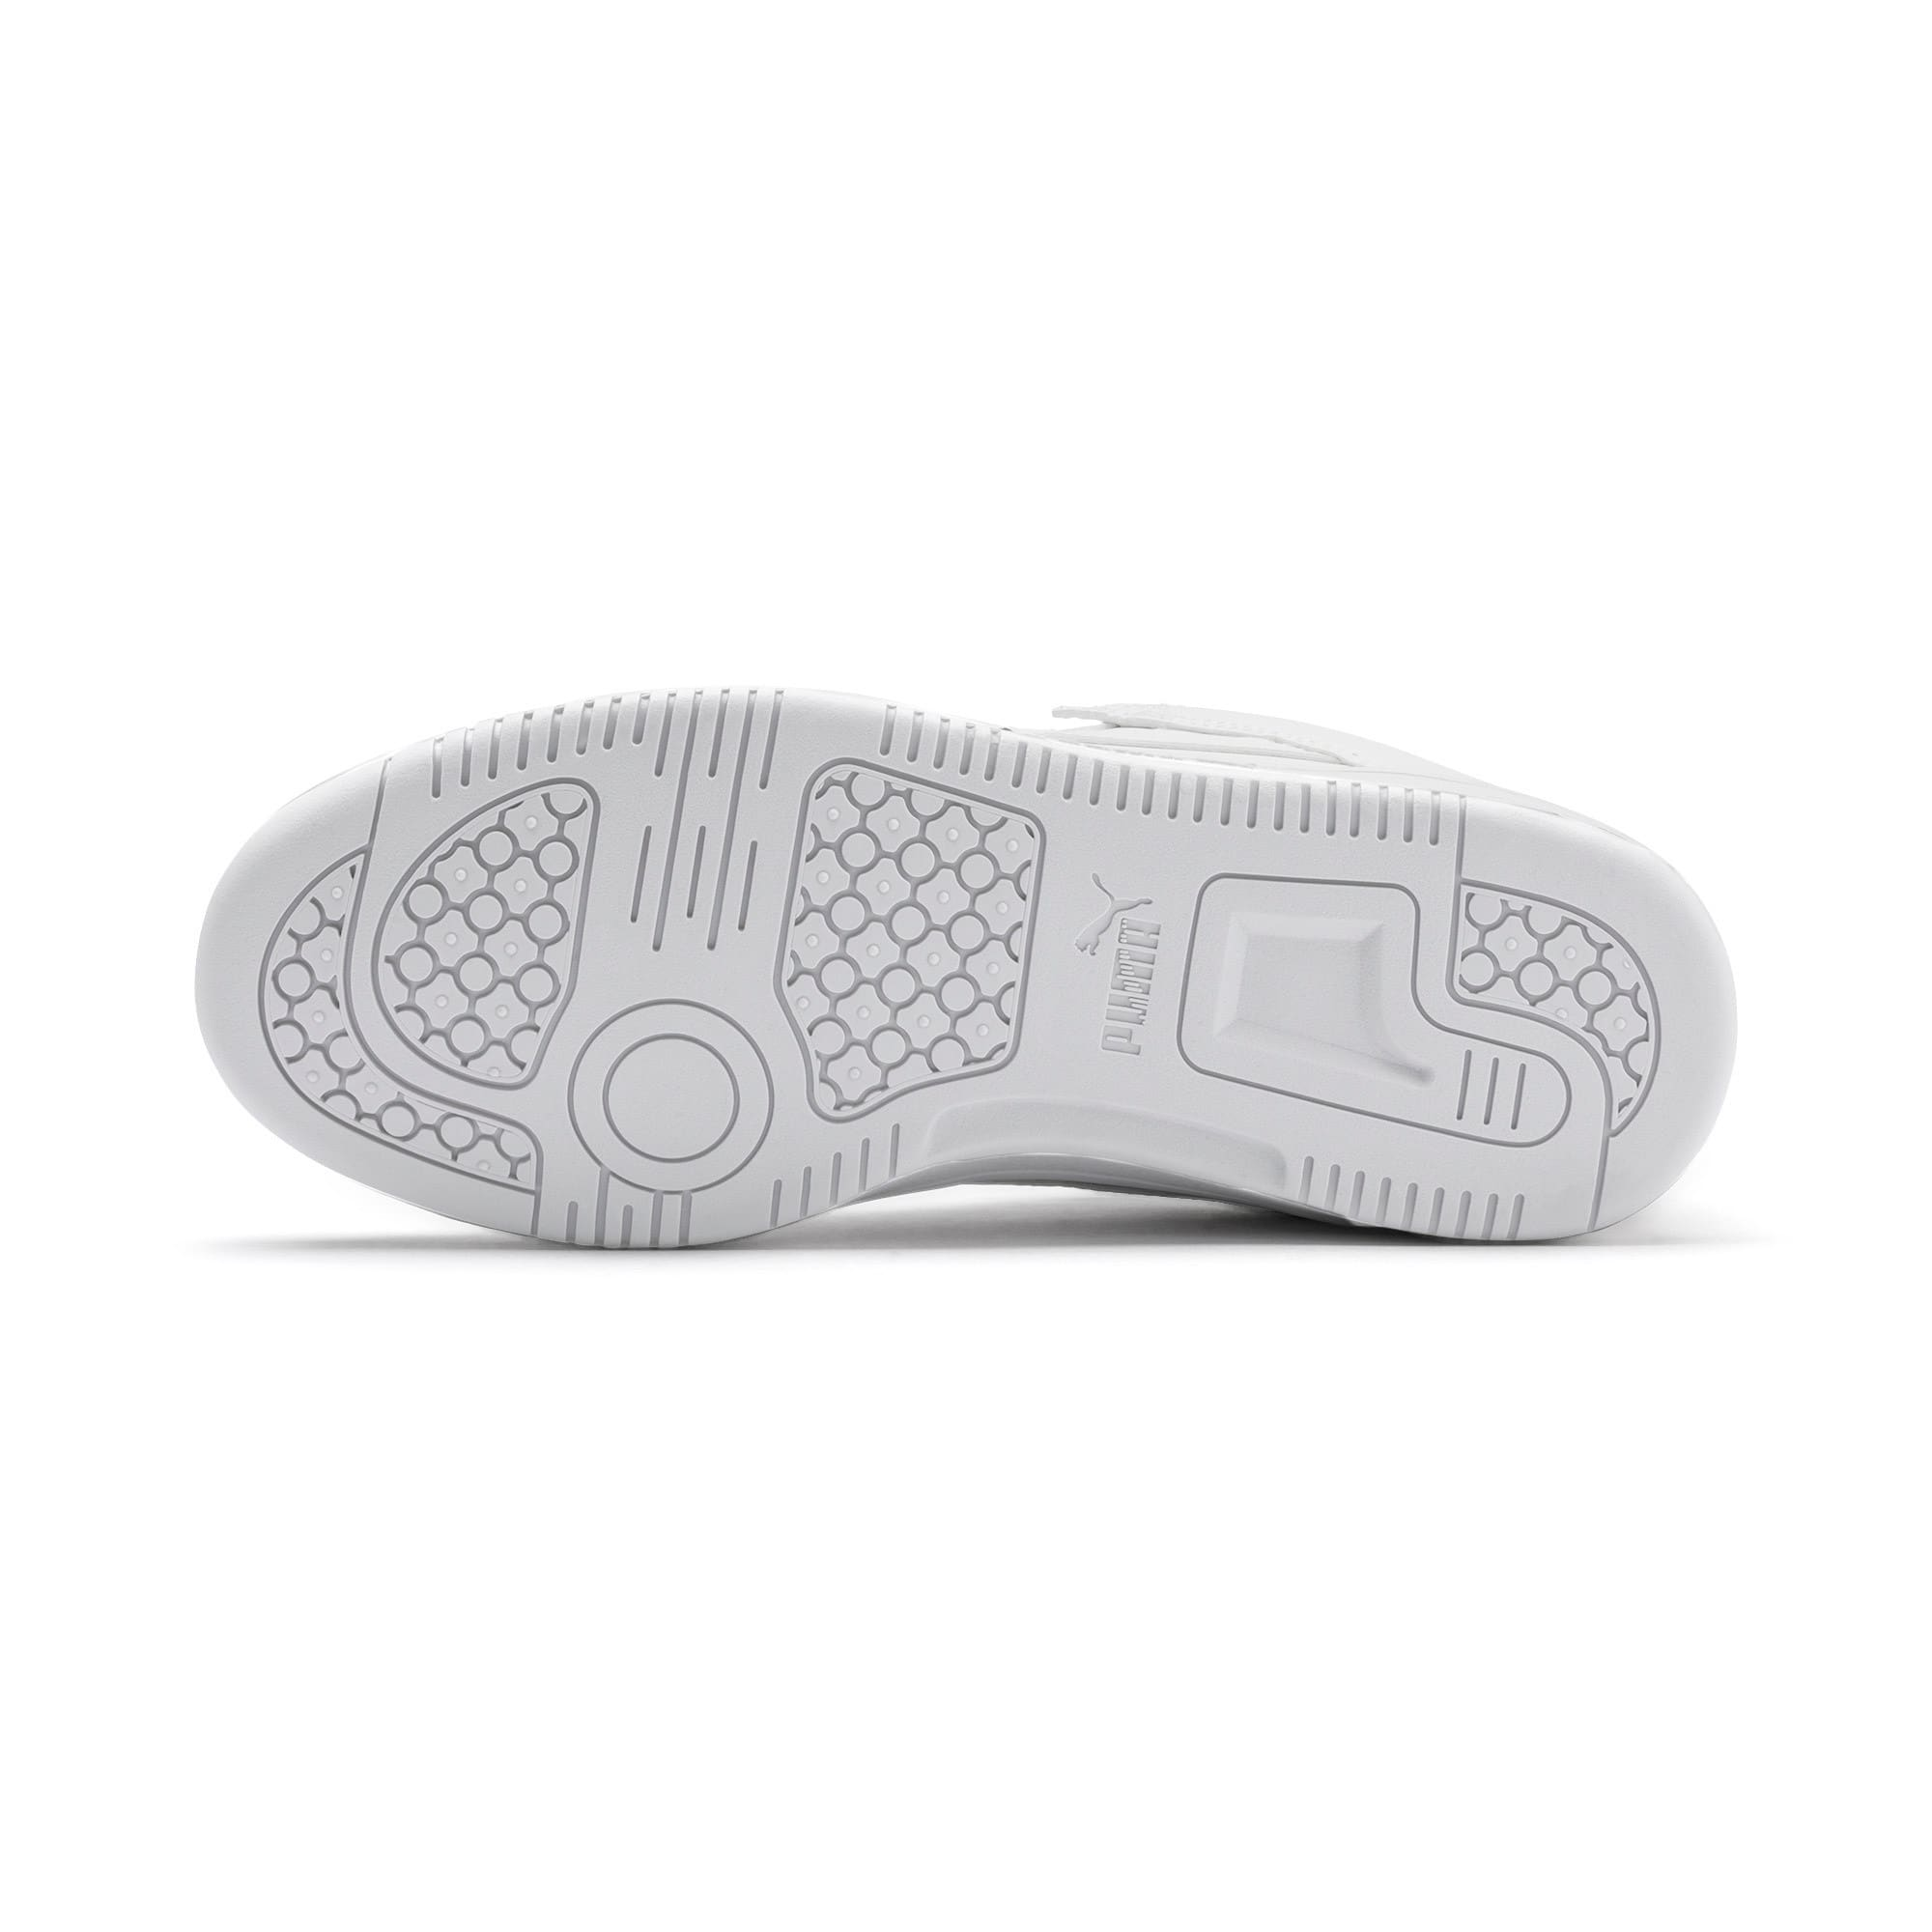 Thumbnail 4 of PUMA Rebound LayUp Lo Sneakers JR, Puma White-High Rise, medium